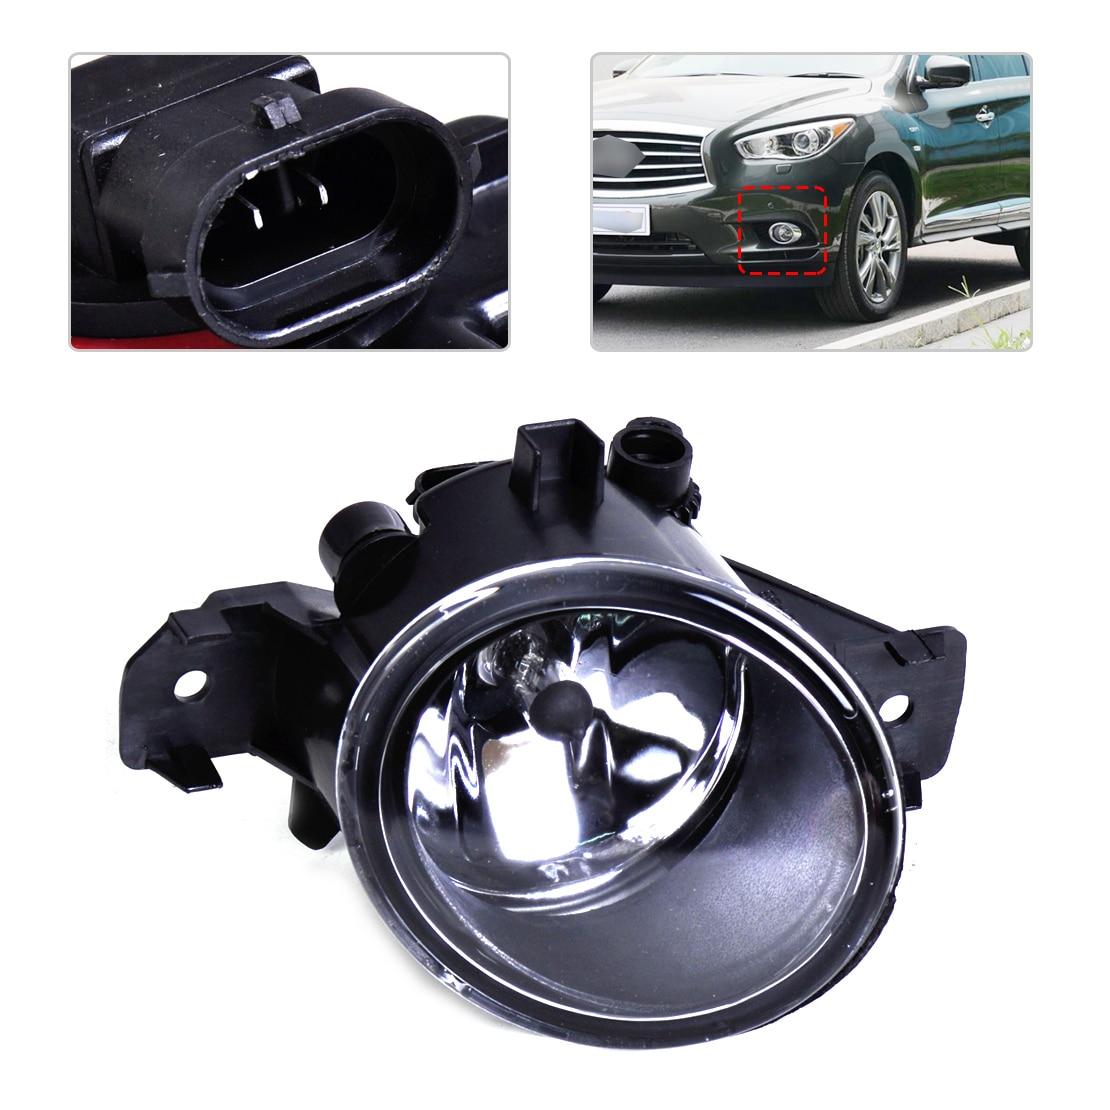 DWCX 26155-89927 Left Fog Light Lamp + Halogen Bulb for Nissan Altima Sentra Maxima Rogue Versa Infiniti G37 QX60 JX35 M35